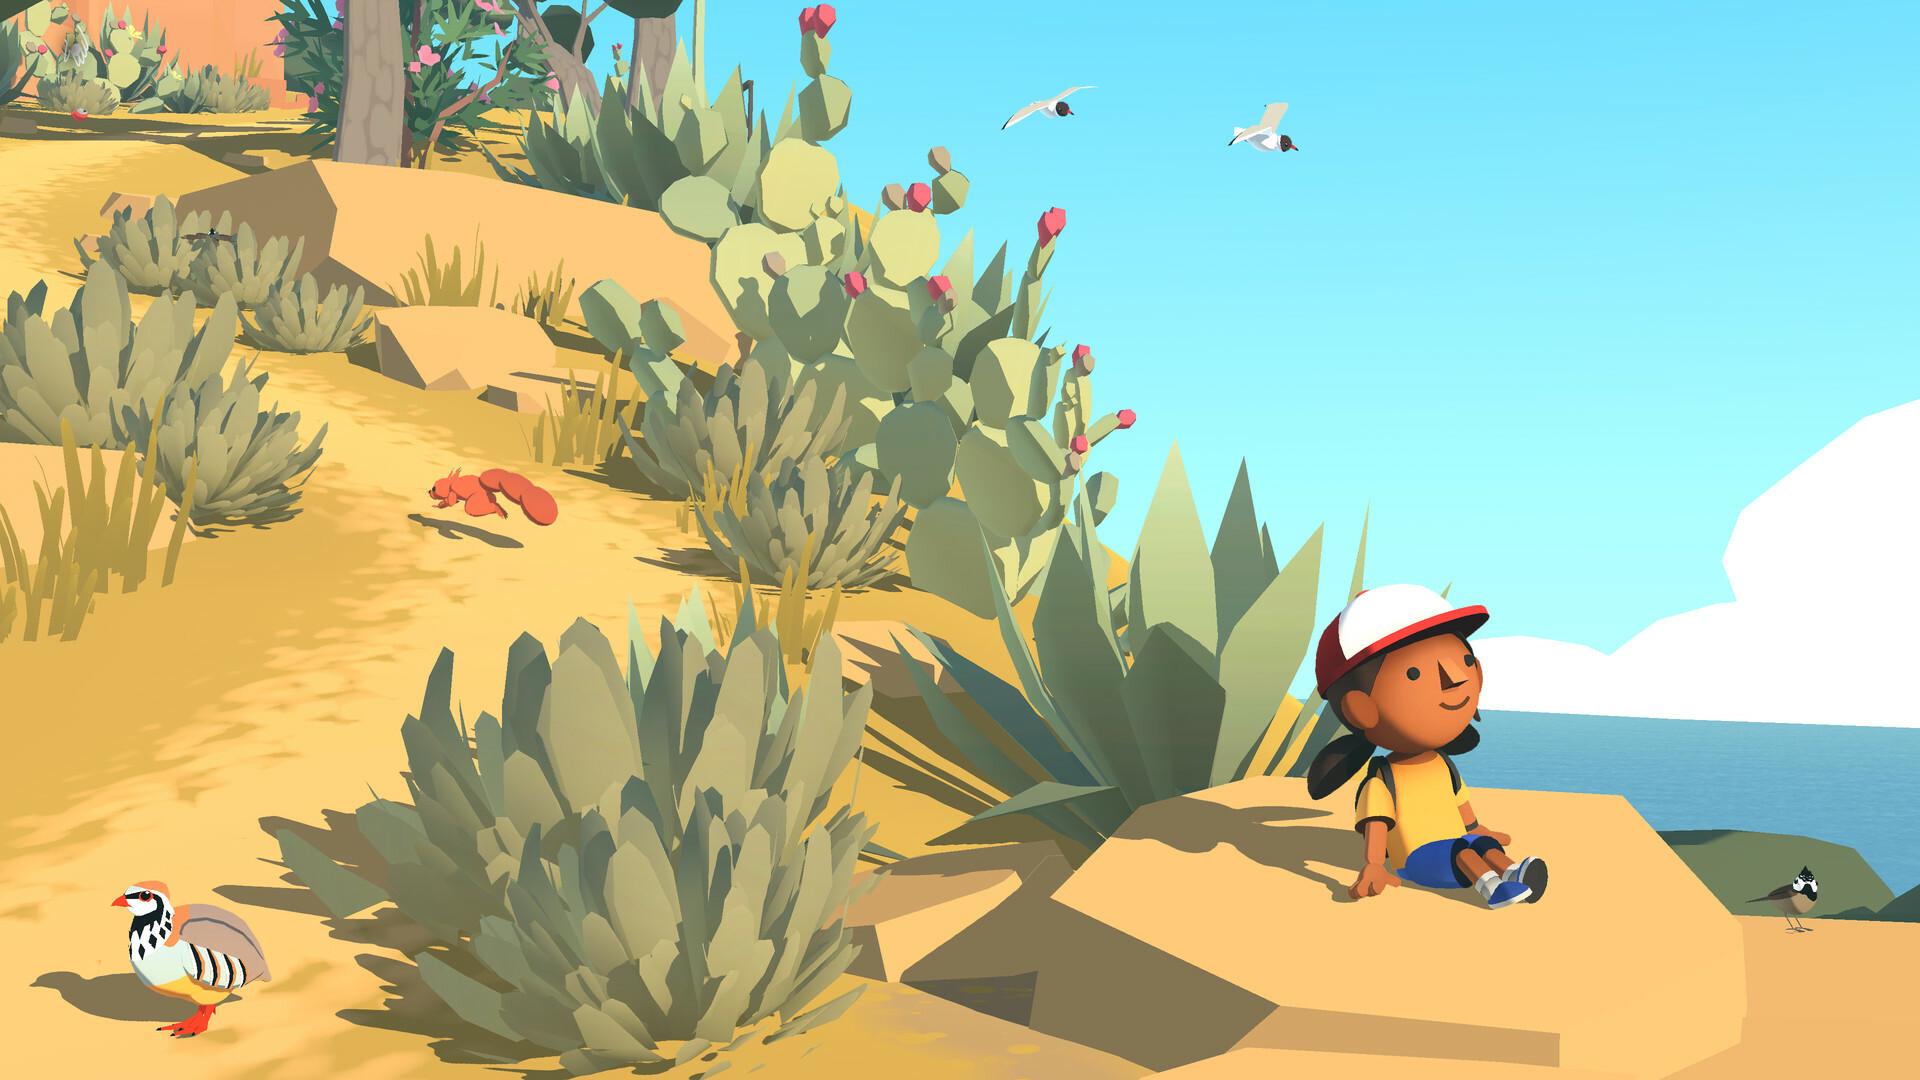 alba-a-wildlife-adventure-pc-screenshot-02